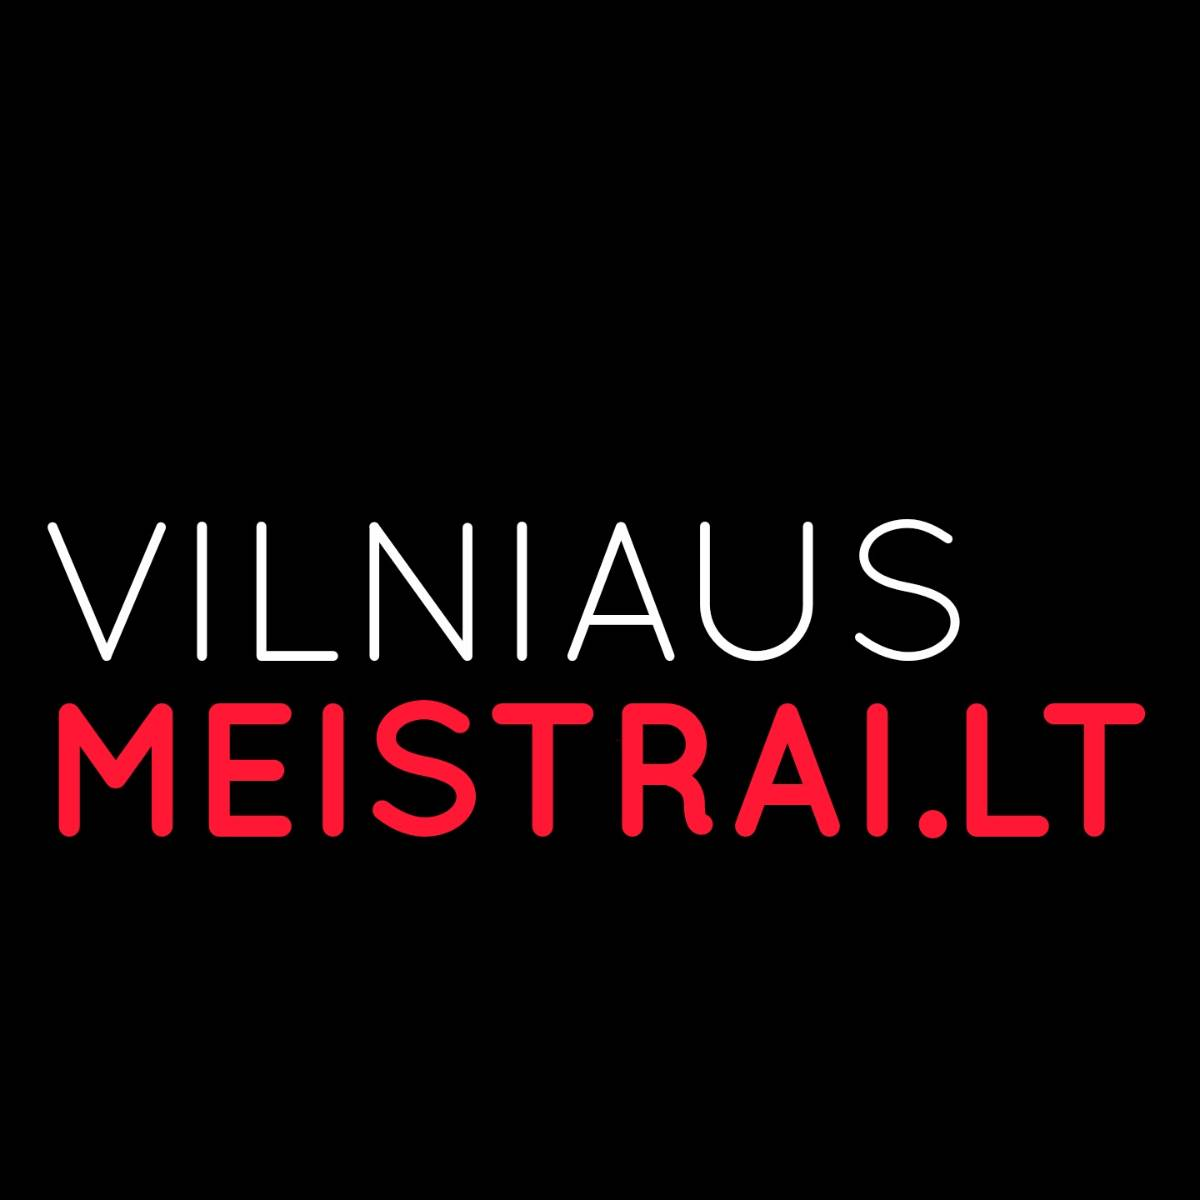 Buitinės technikos remontas Vilniausmeistrai.eu